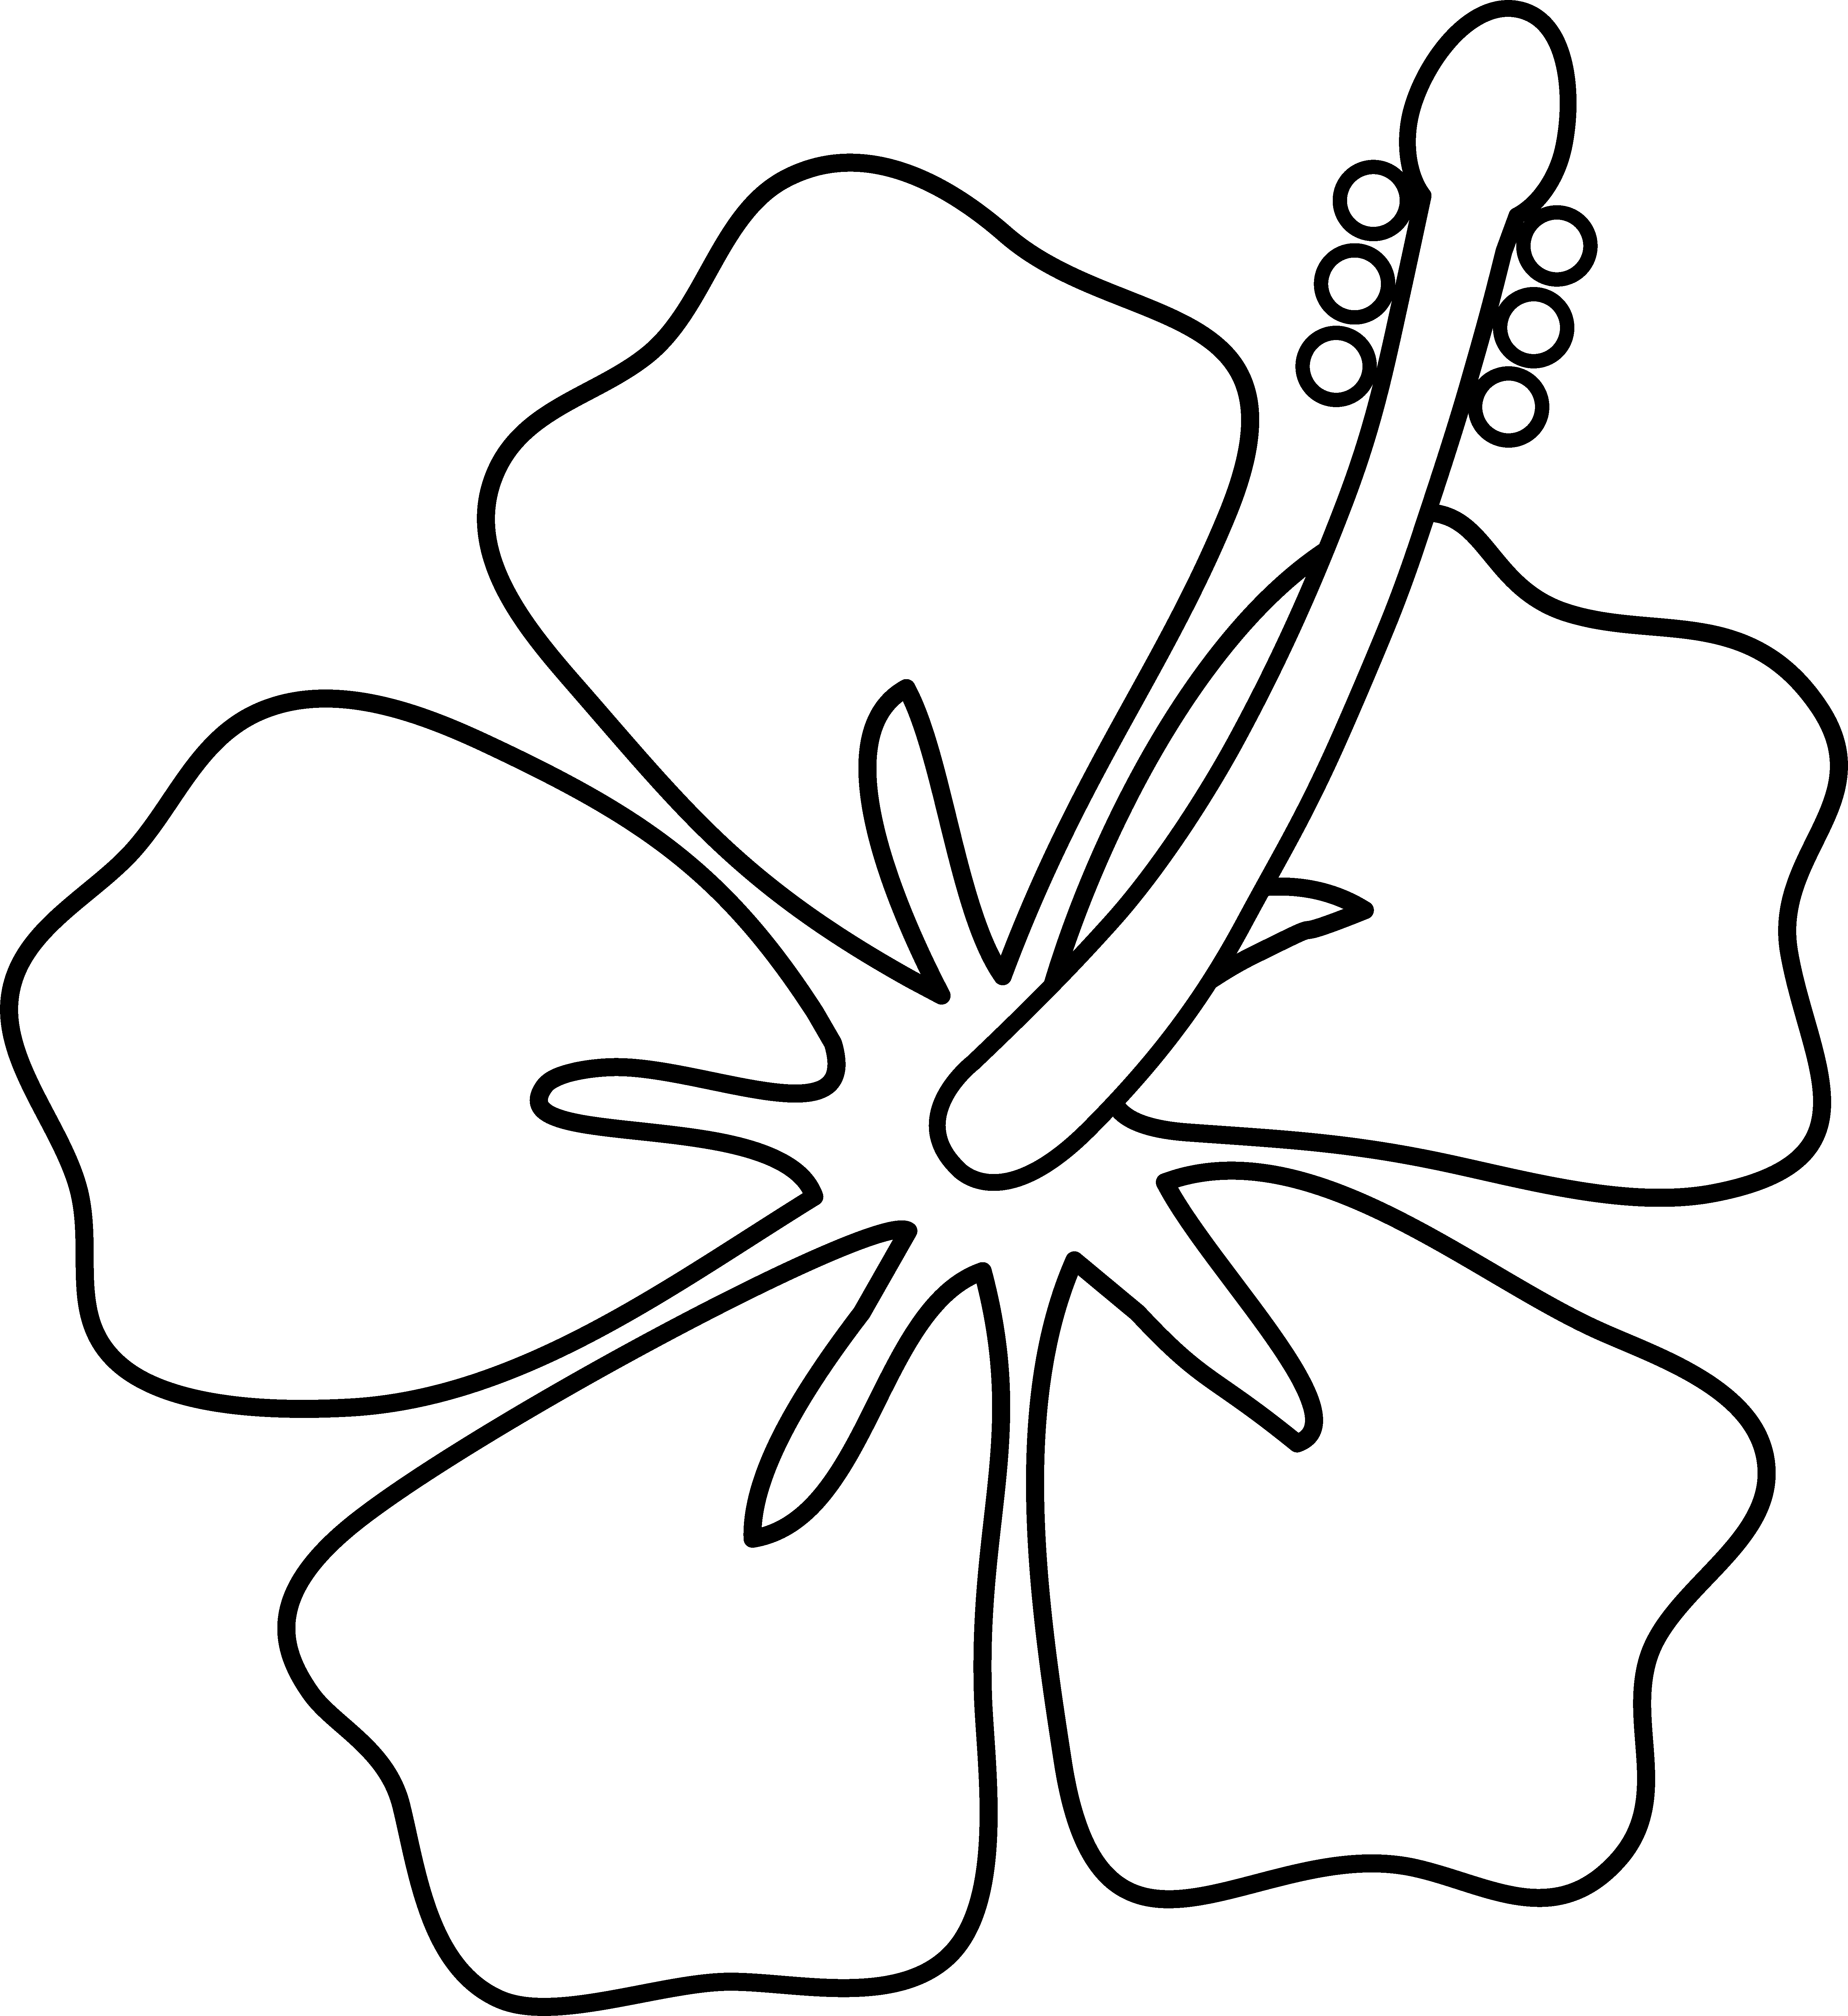 Flower free clip outline. Hibiscus clipart line art